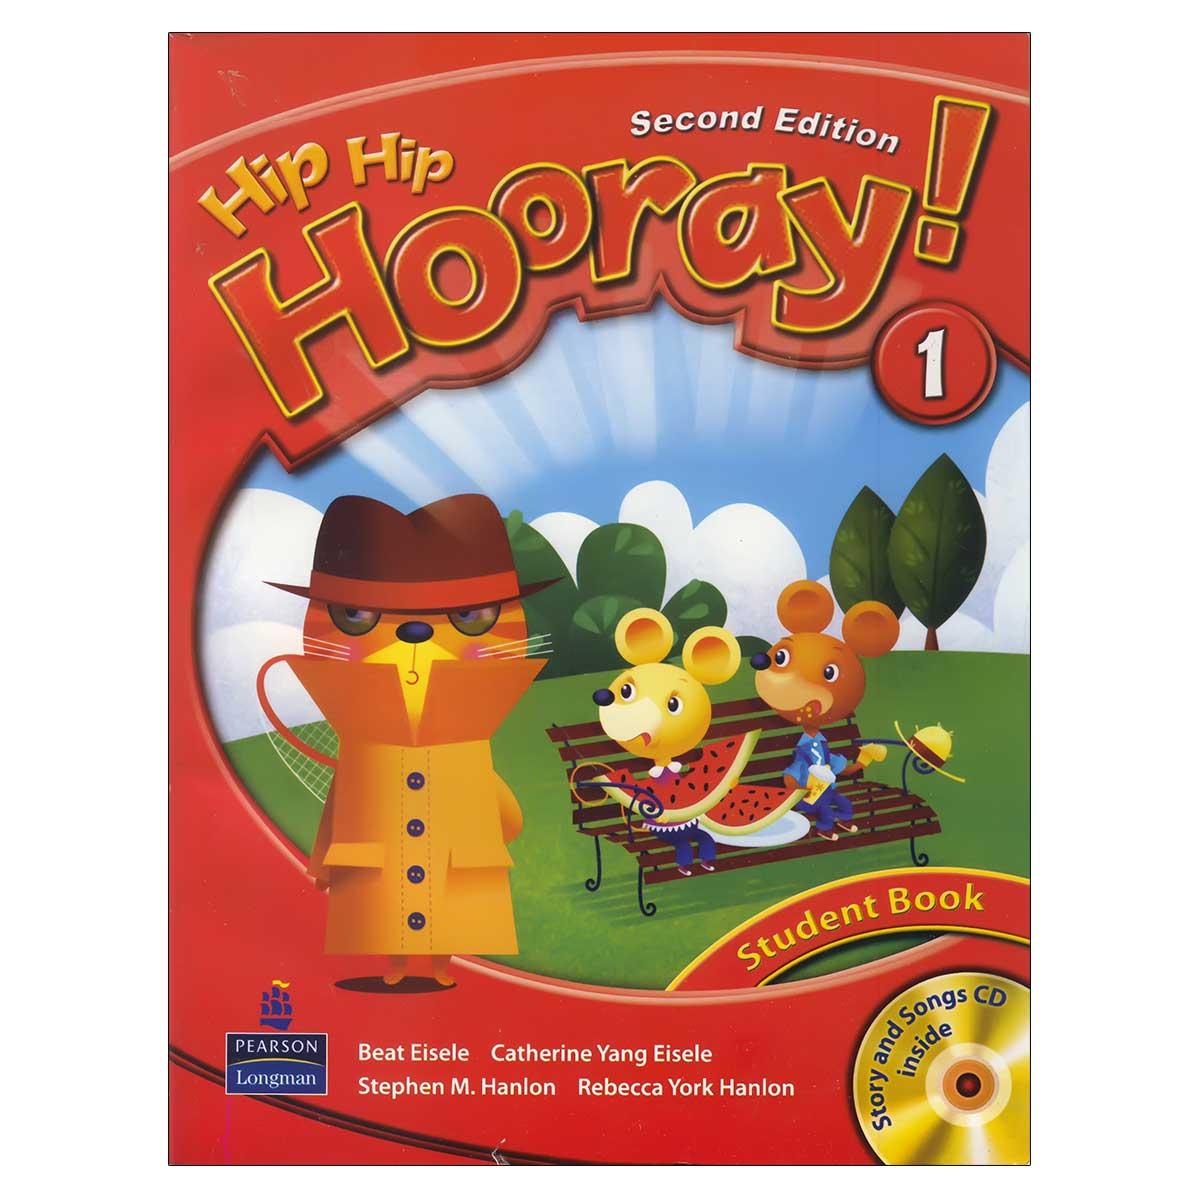 کتاب Hip Hip Hooray 1 اثر جمعی از نویسندگان انتشارات لانگمن